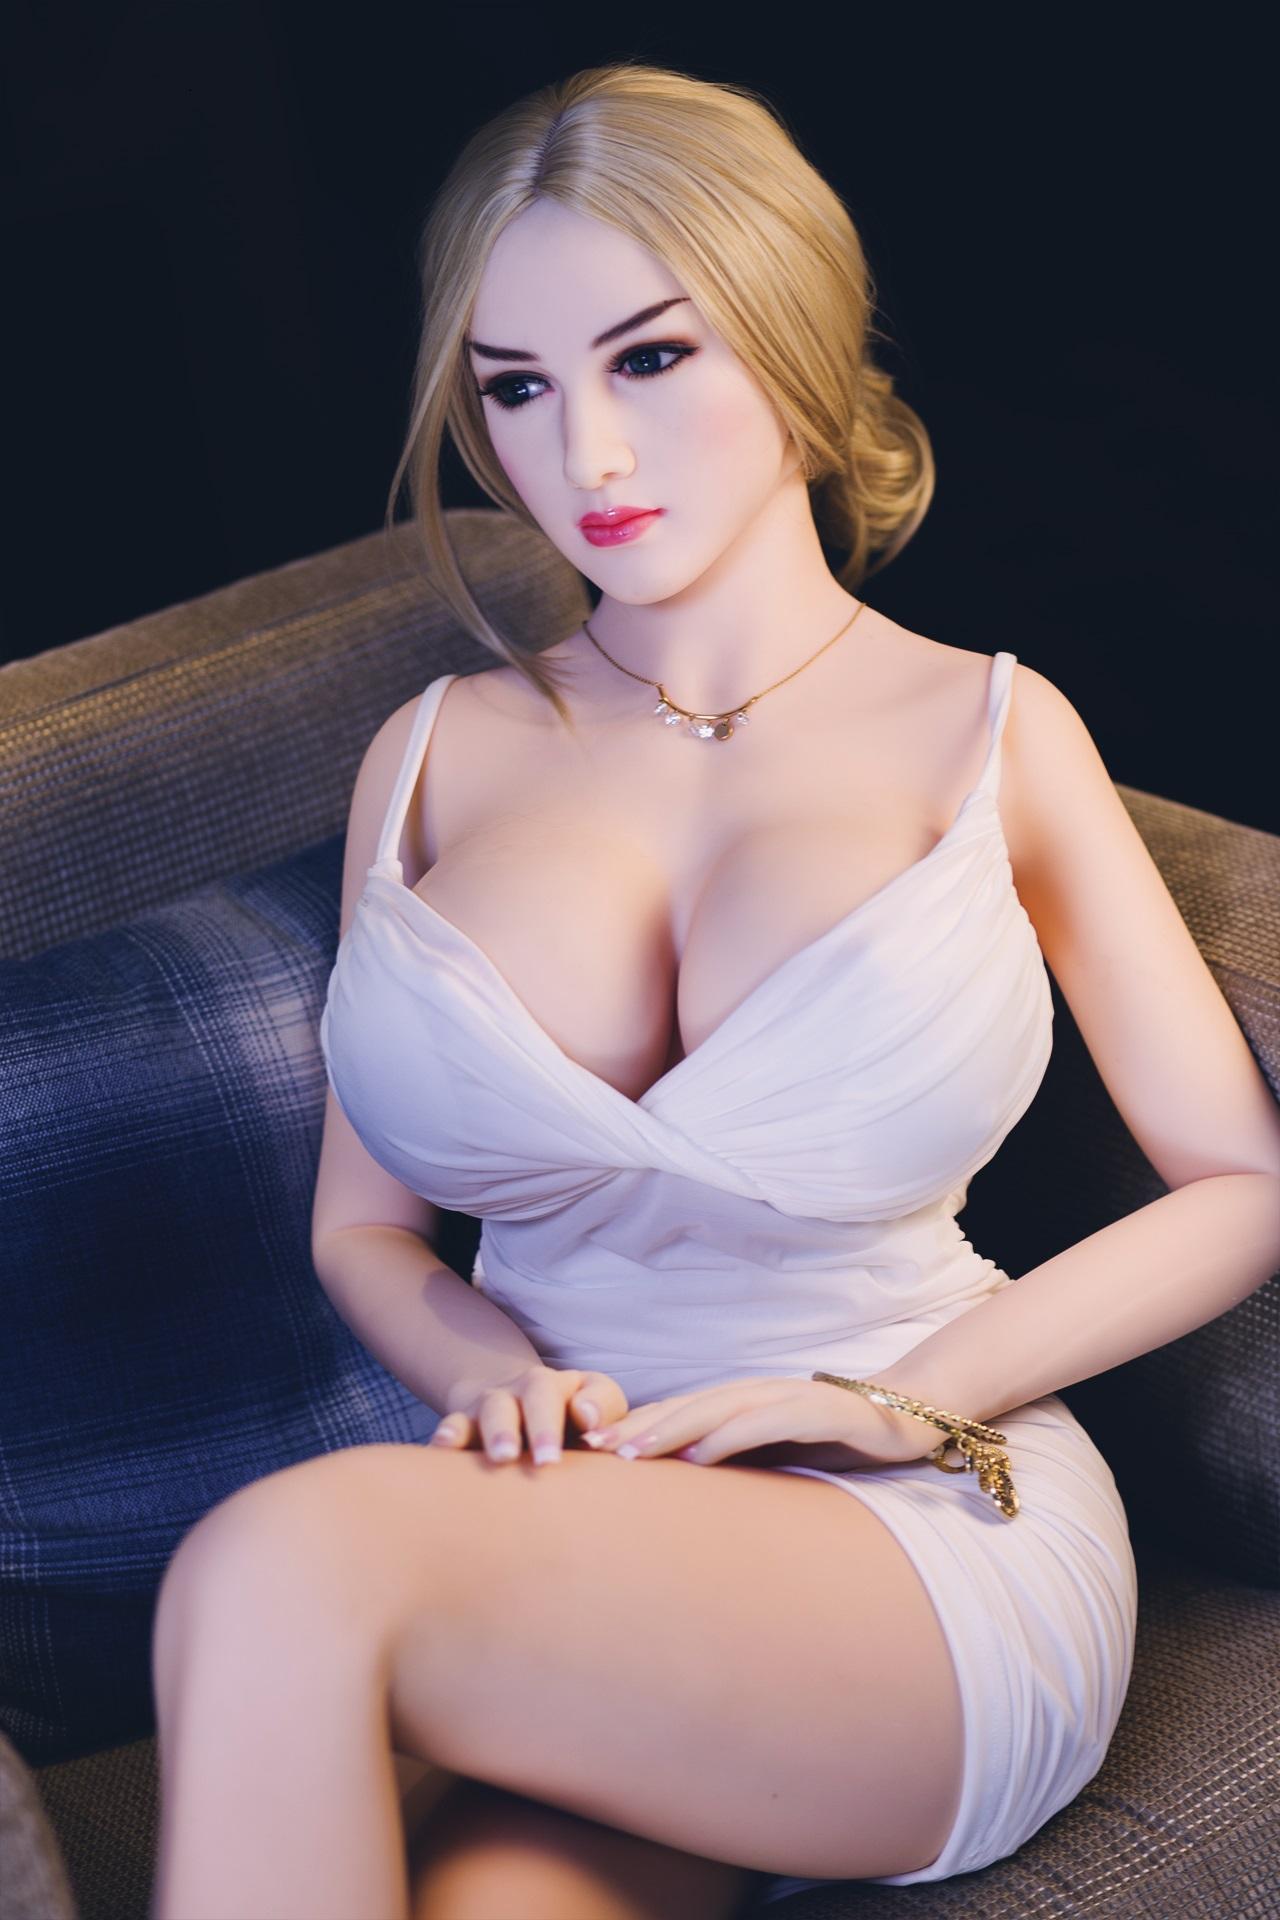 Biggest breast sex video